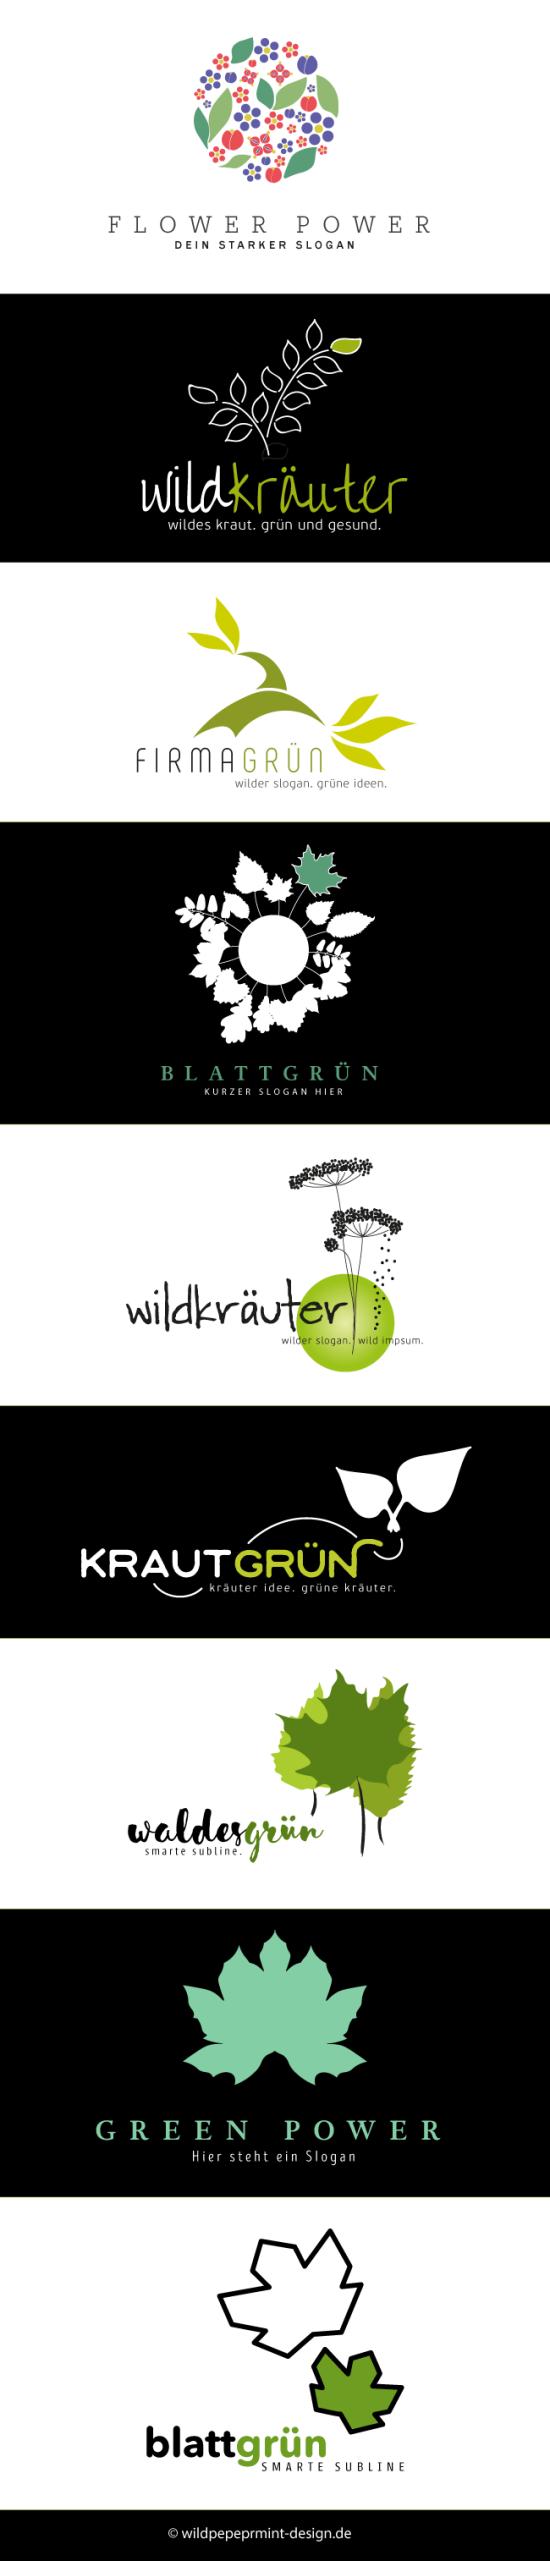 Freie-Logoentwürfe, Garten, Kräuter, Logo Gartenbau, Logo Kräuter, Logo grüne Branche, Logo Gärtner, Logo Grün, Logos für Gartenbau, Logo-Design, Logo Blätter, Logo Wildkräuter, Logo Wald, Logo Baum, wildpeppermint-design